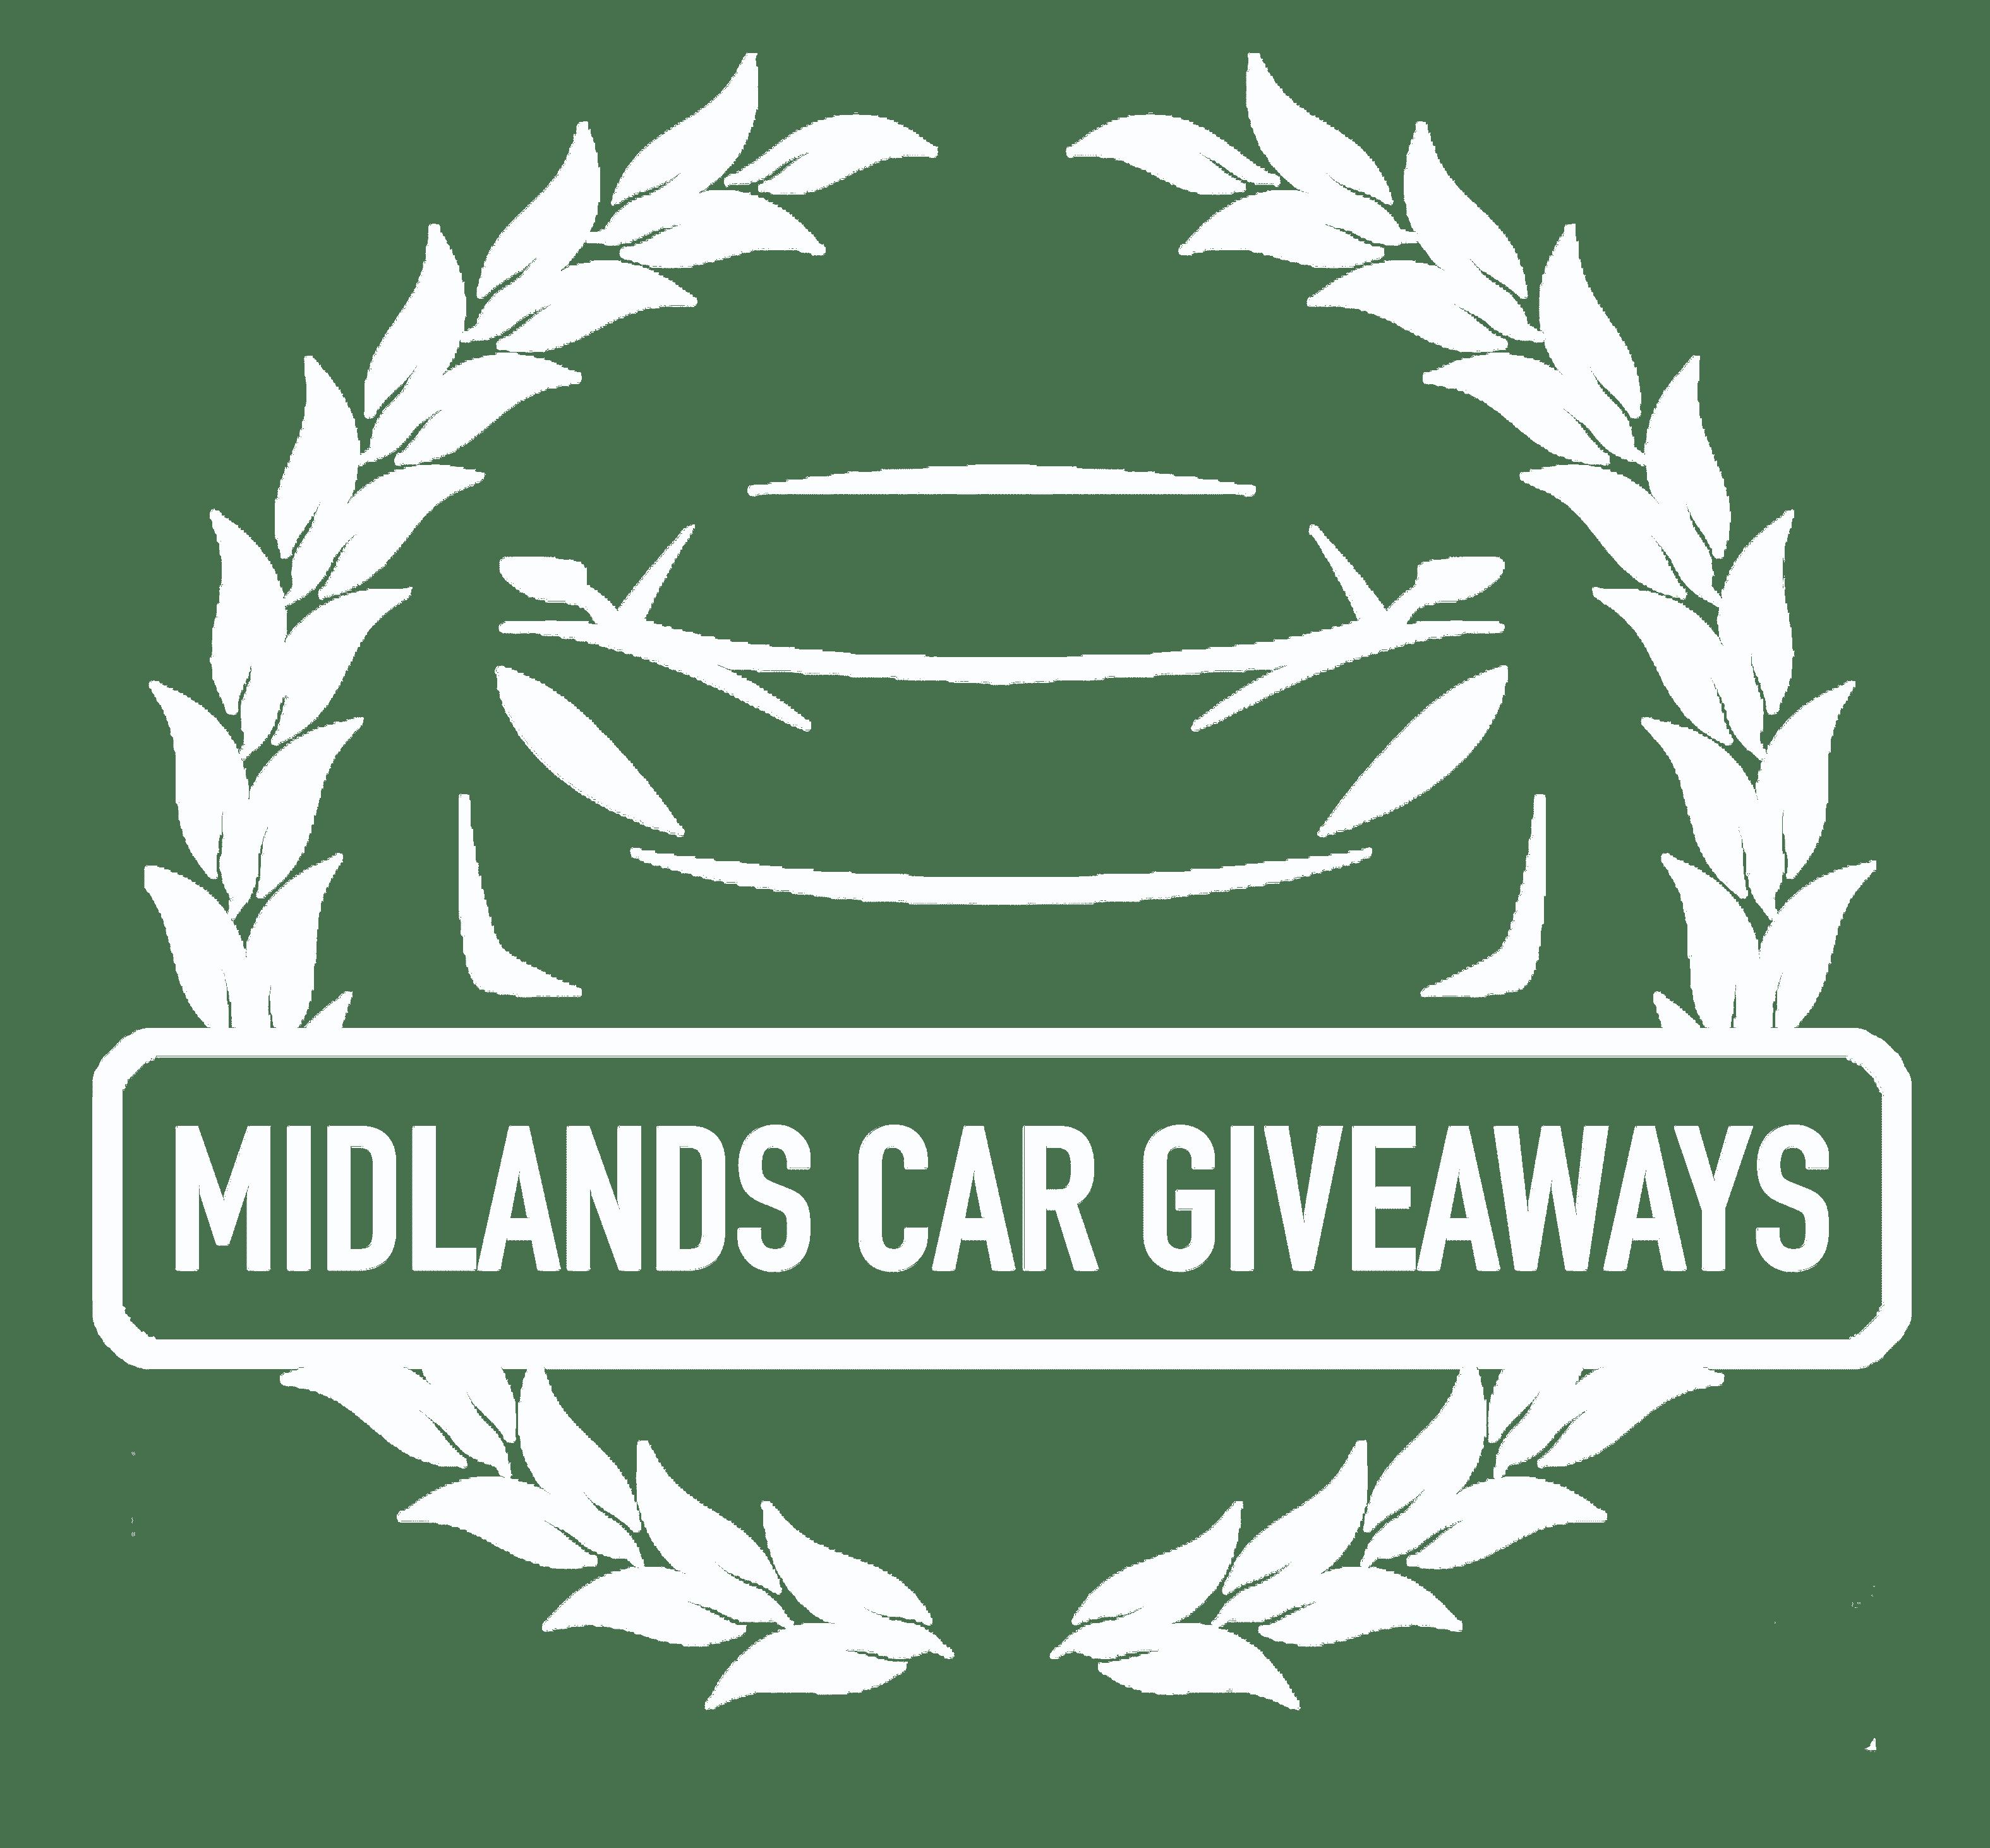 Midlands Car Giveaways Ltd